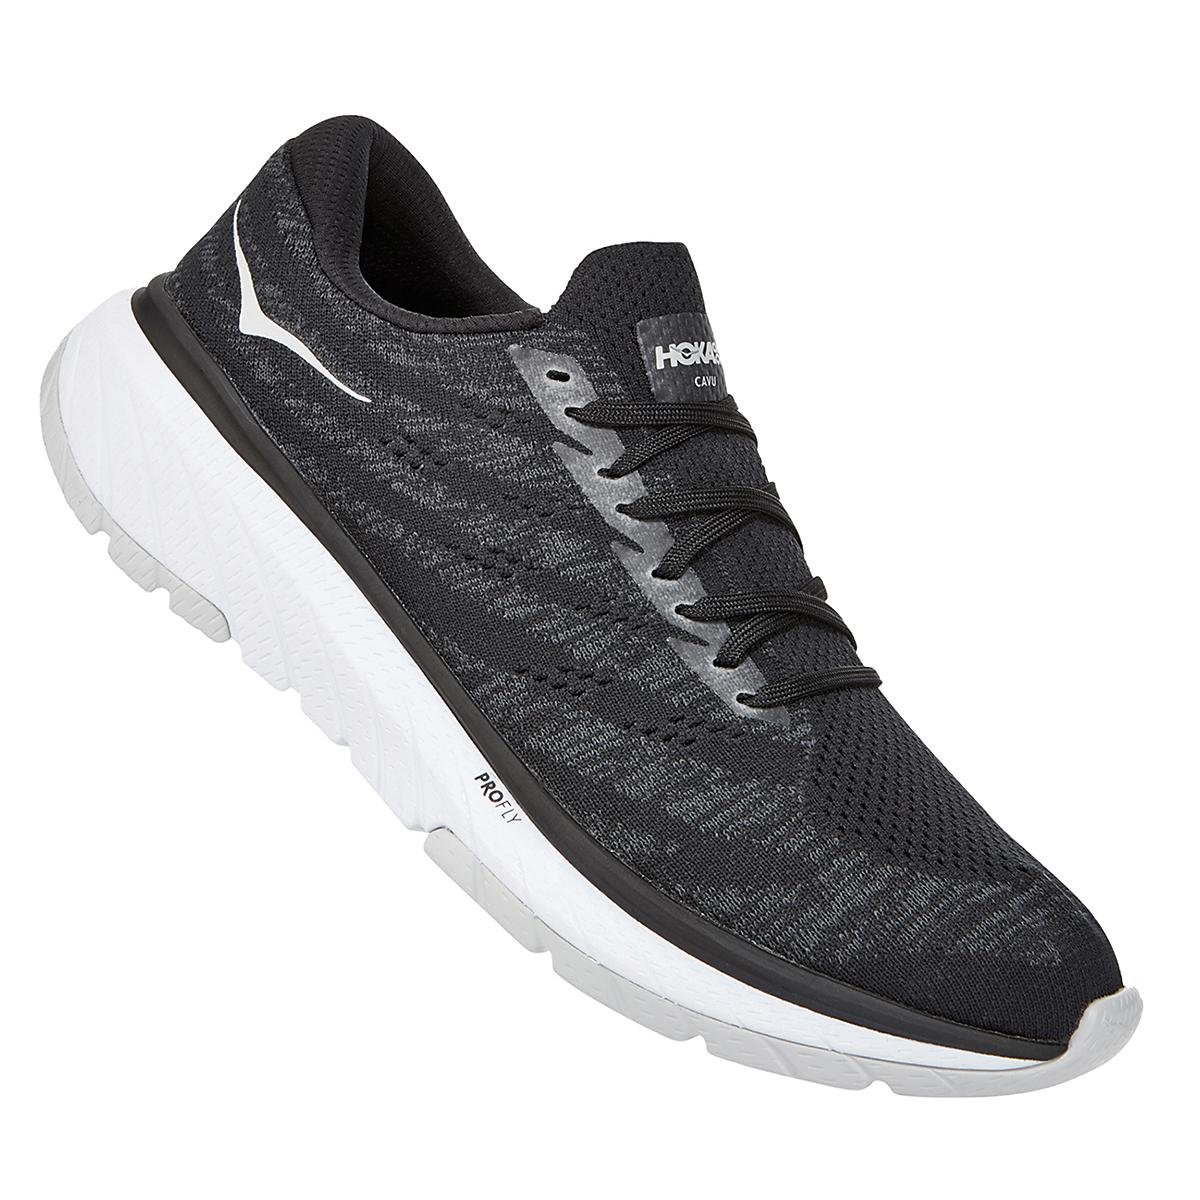 Men's Hoka One One Cavu 3 Running Shoe - Color: Black/White - Size: 7 - Width: Regular, Black/White, large, image 3